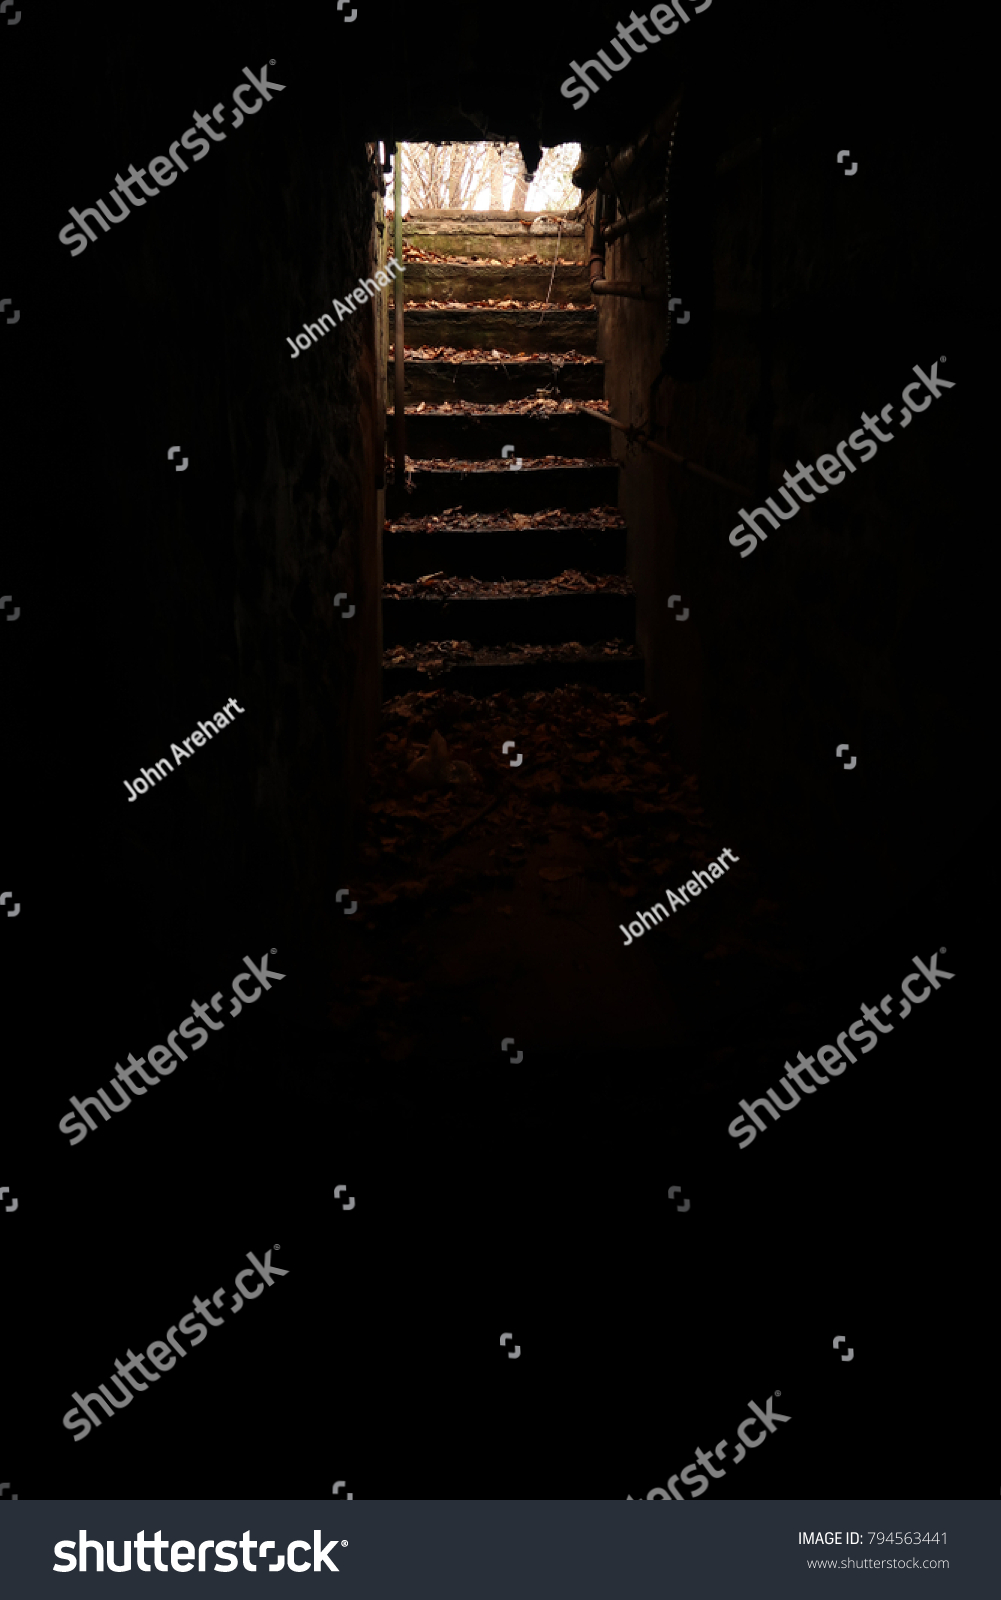 dark basement stairs. Mostly Dark, Spooky Basement. Light Coming From The Stairs. Dark Basement Stairs